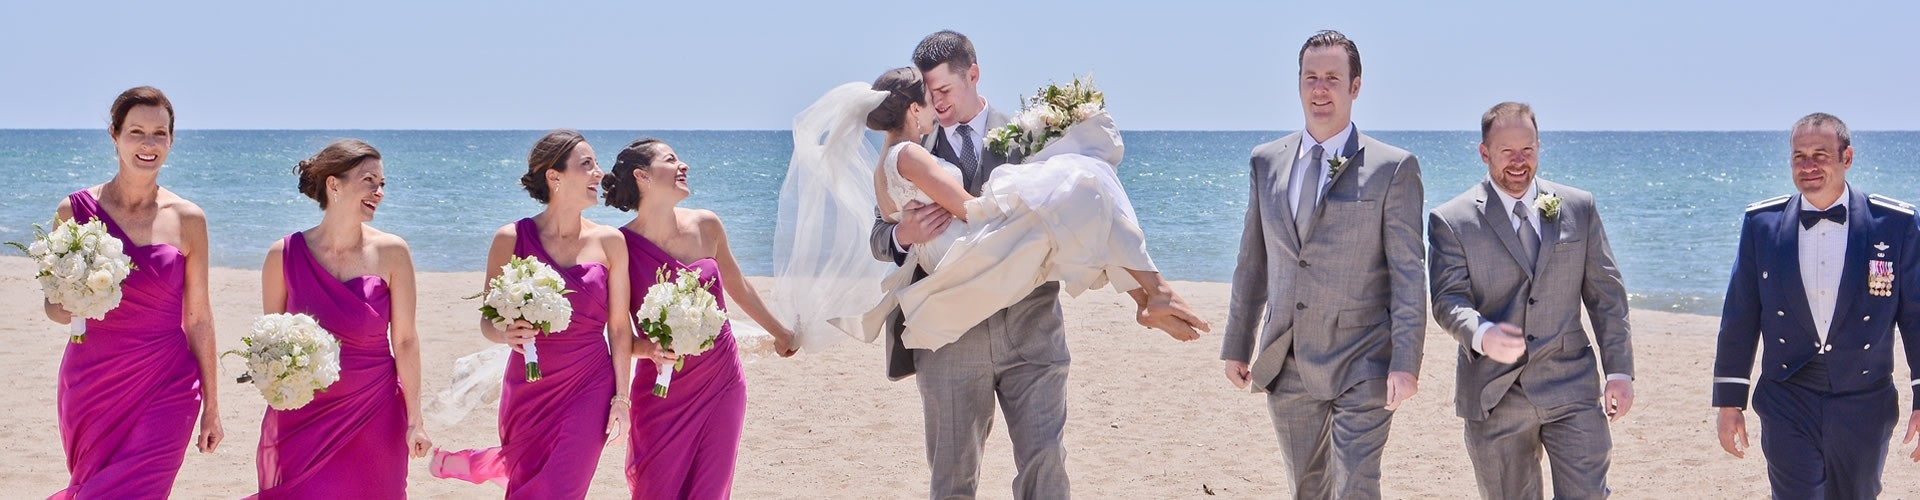 wedding-1439008